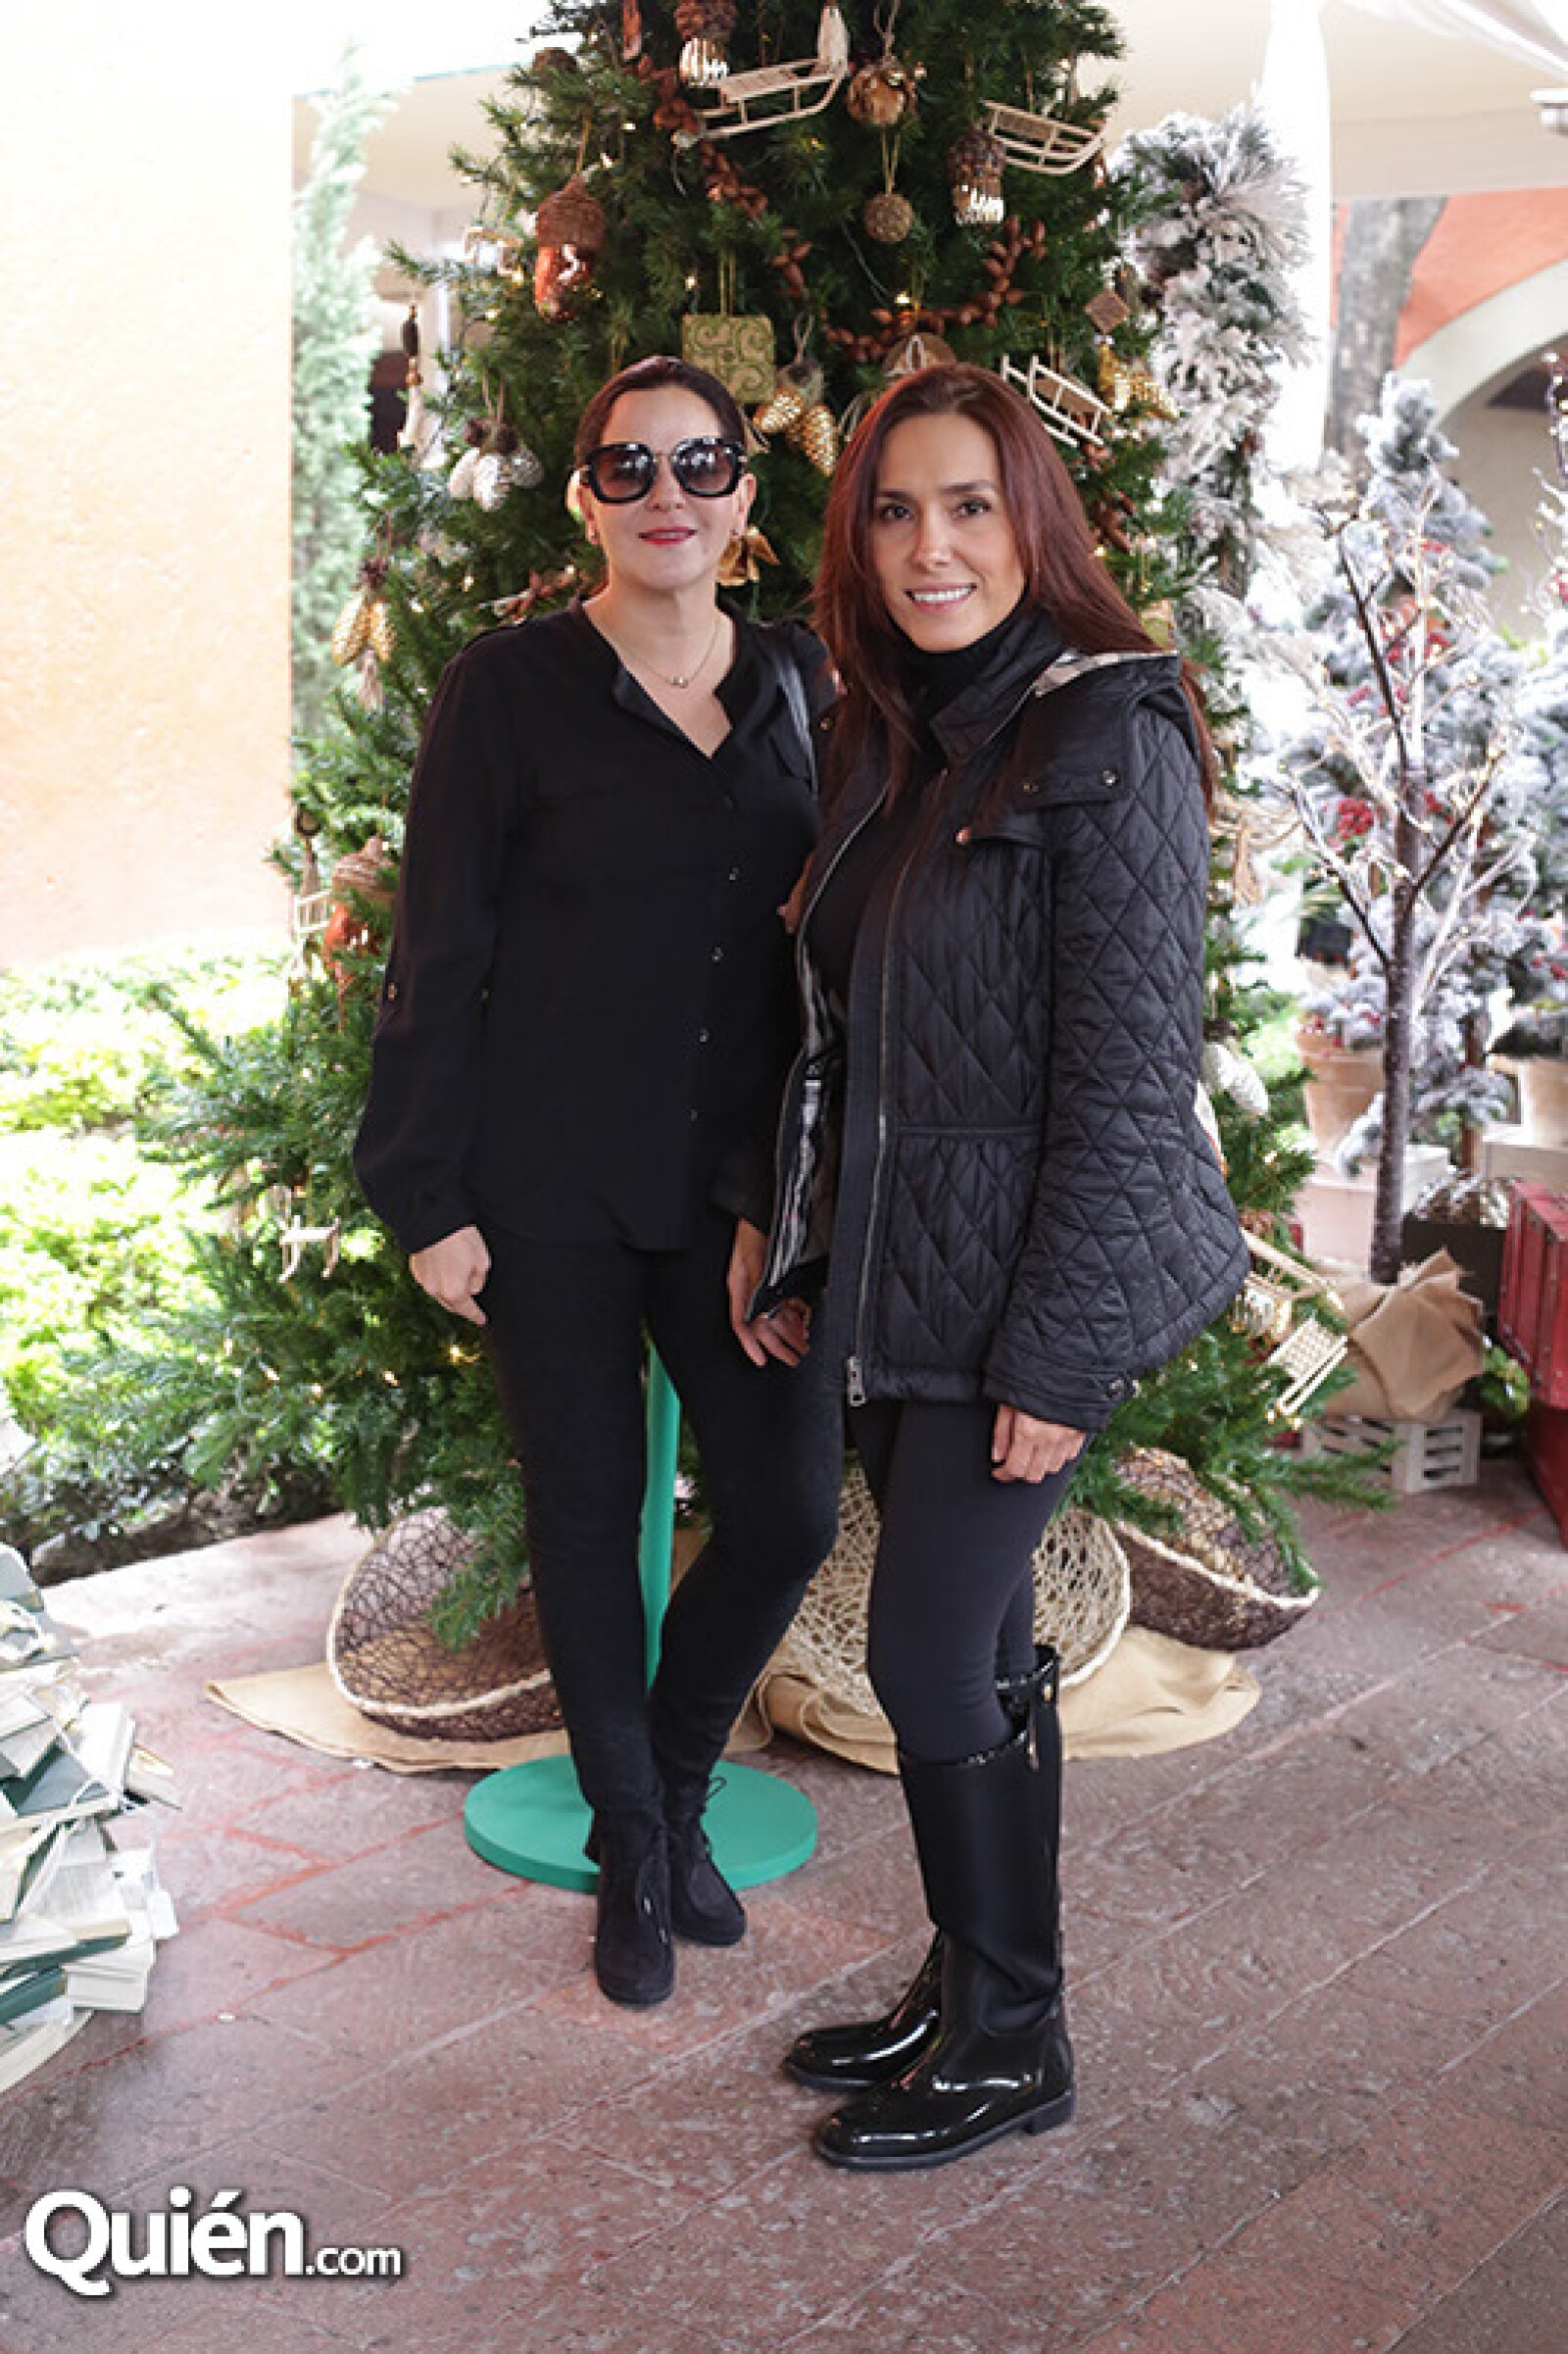 Carolina Martínez y Luisa Huerta